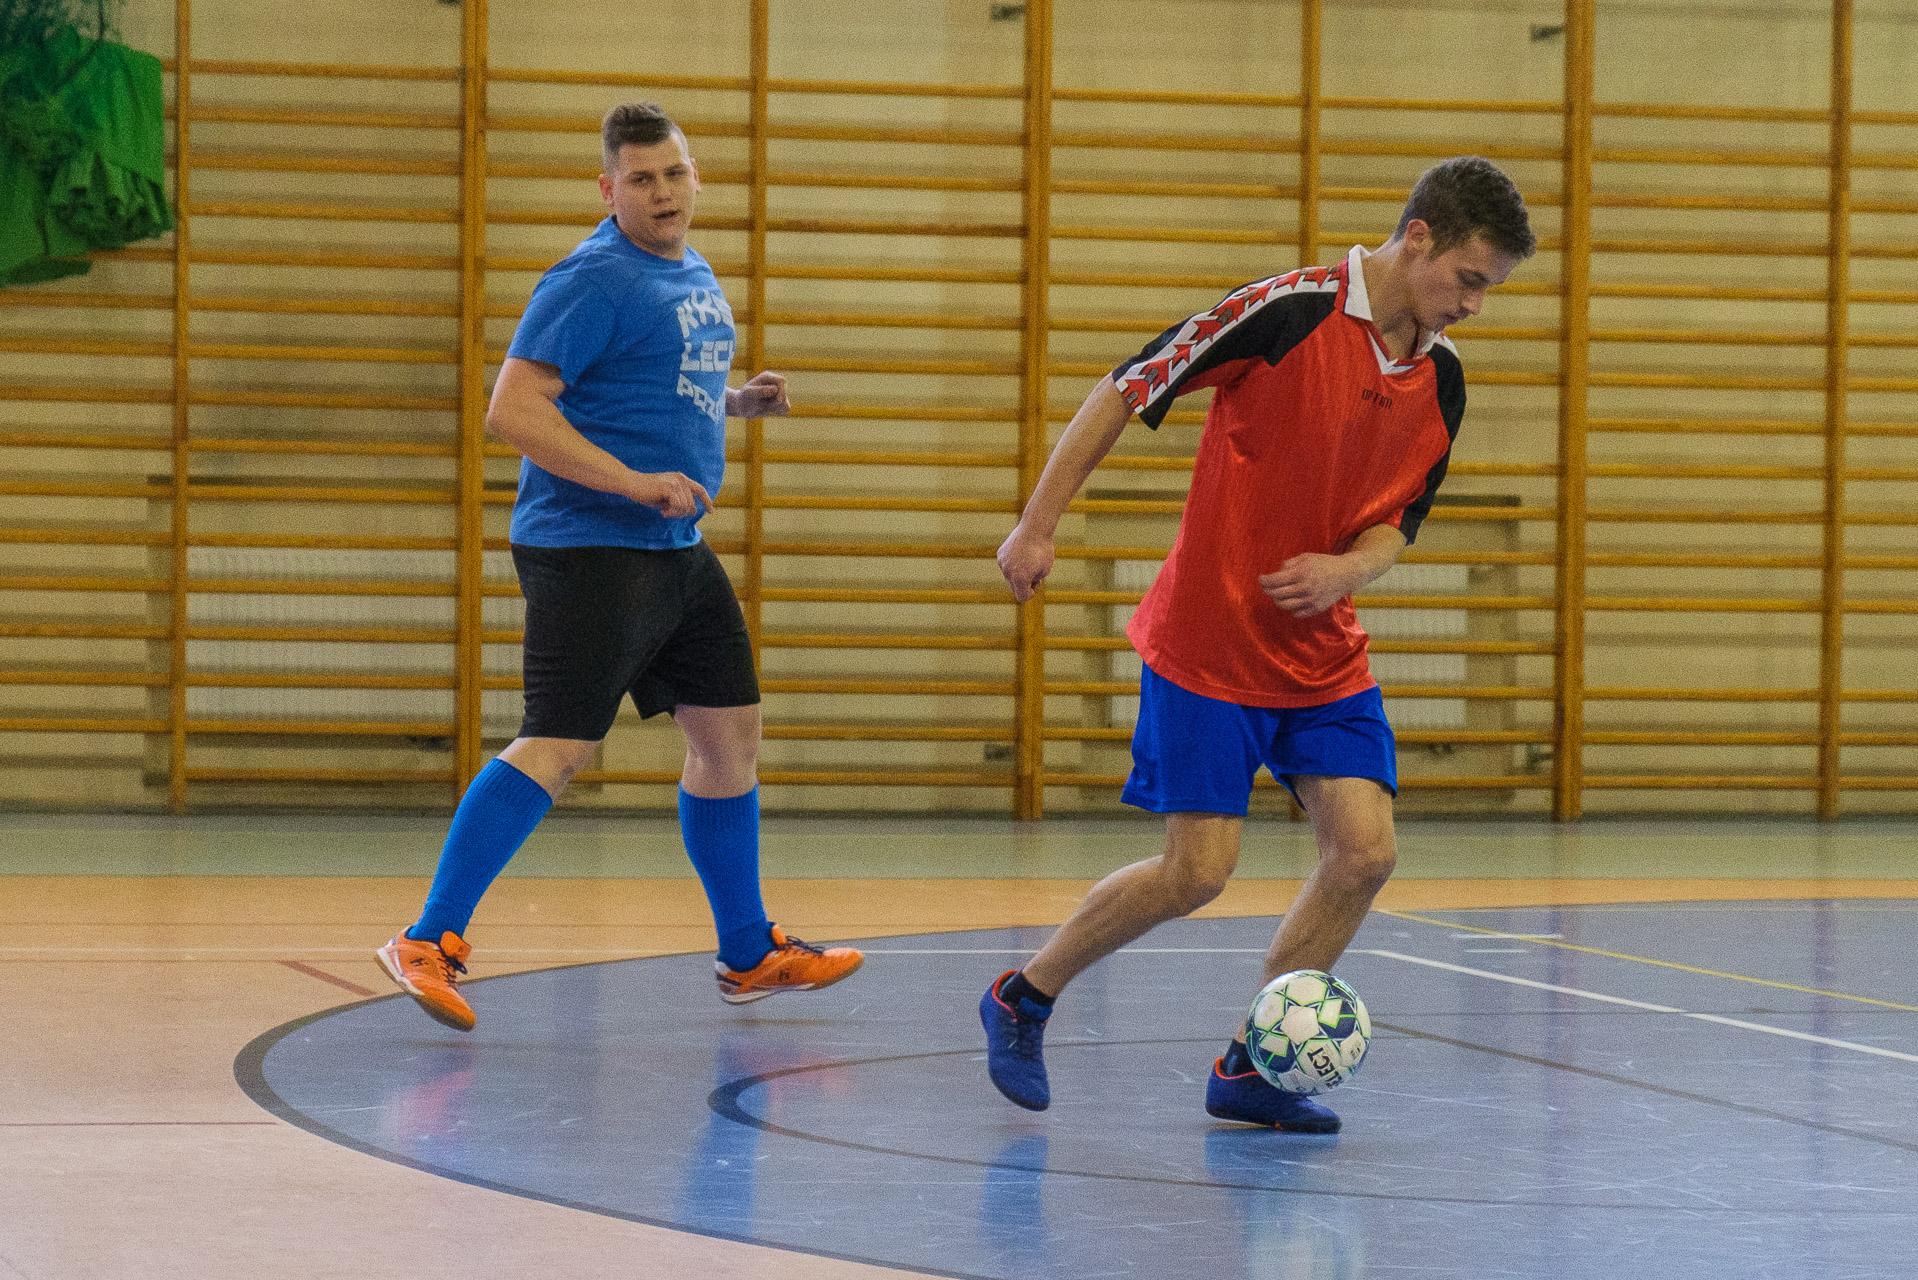 Pniewska Amatorska Liga Futsalu